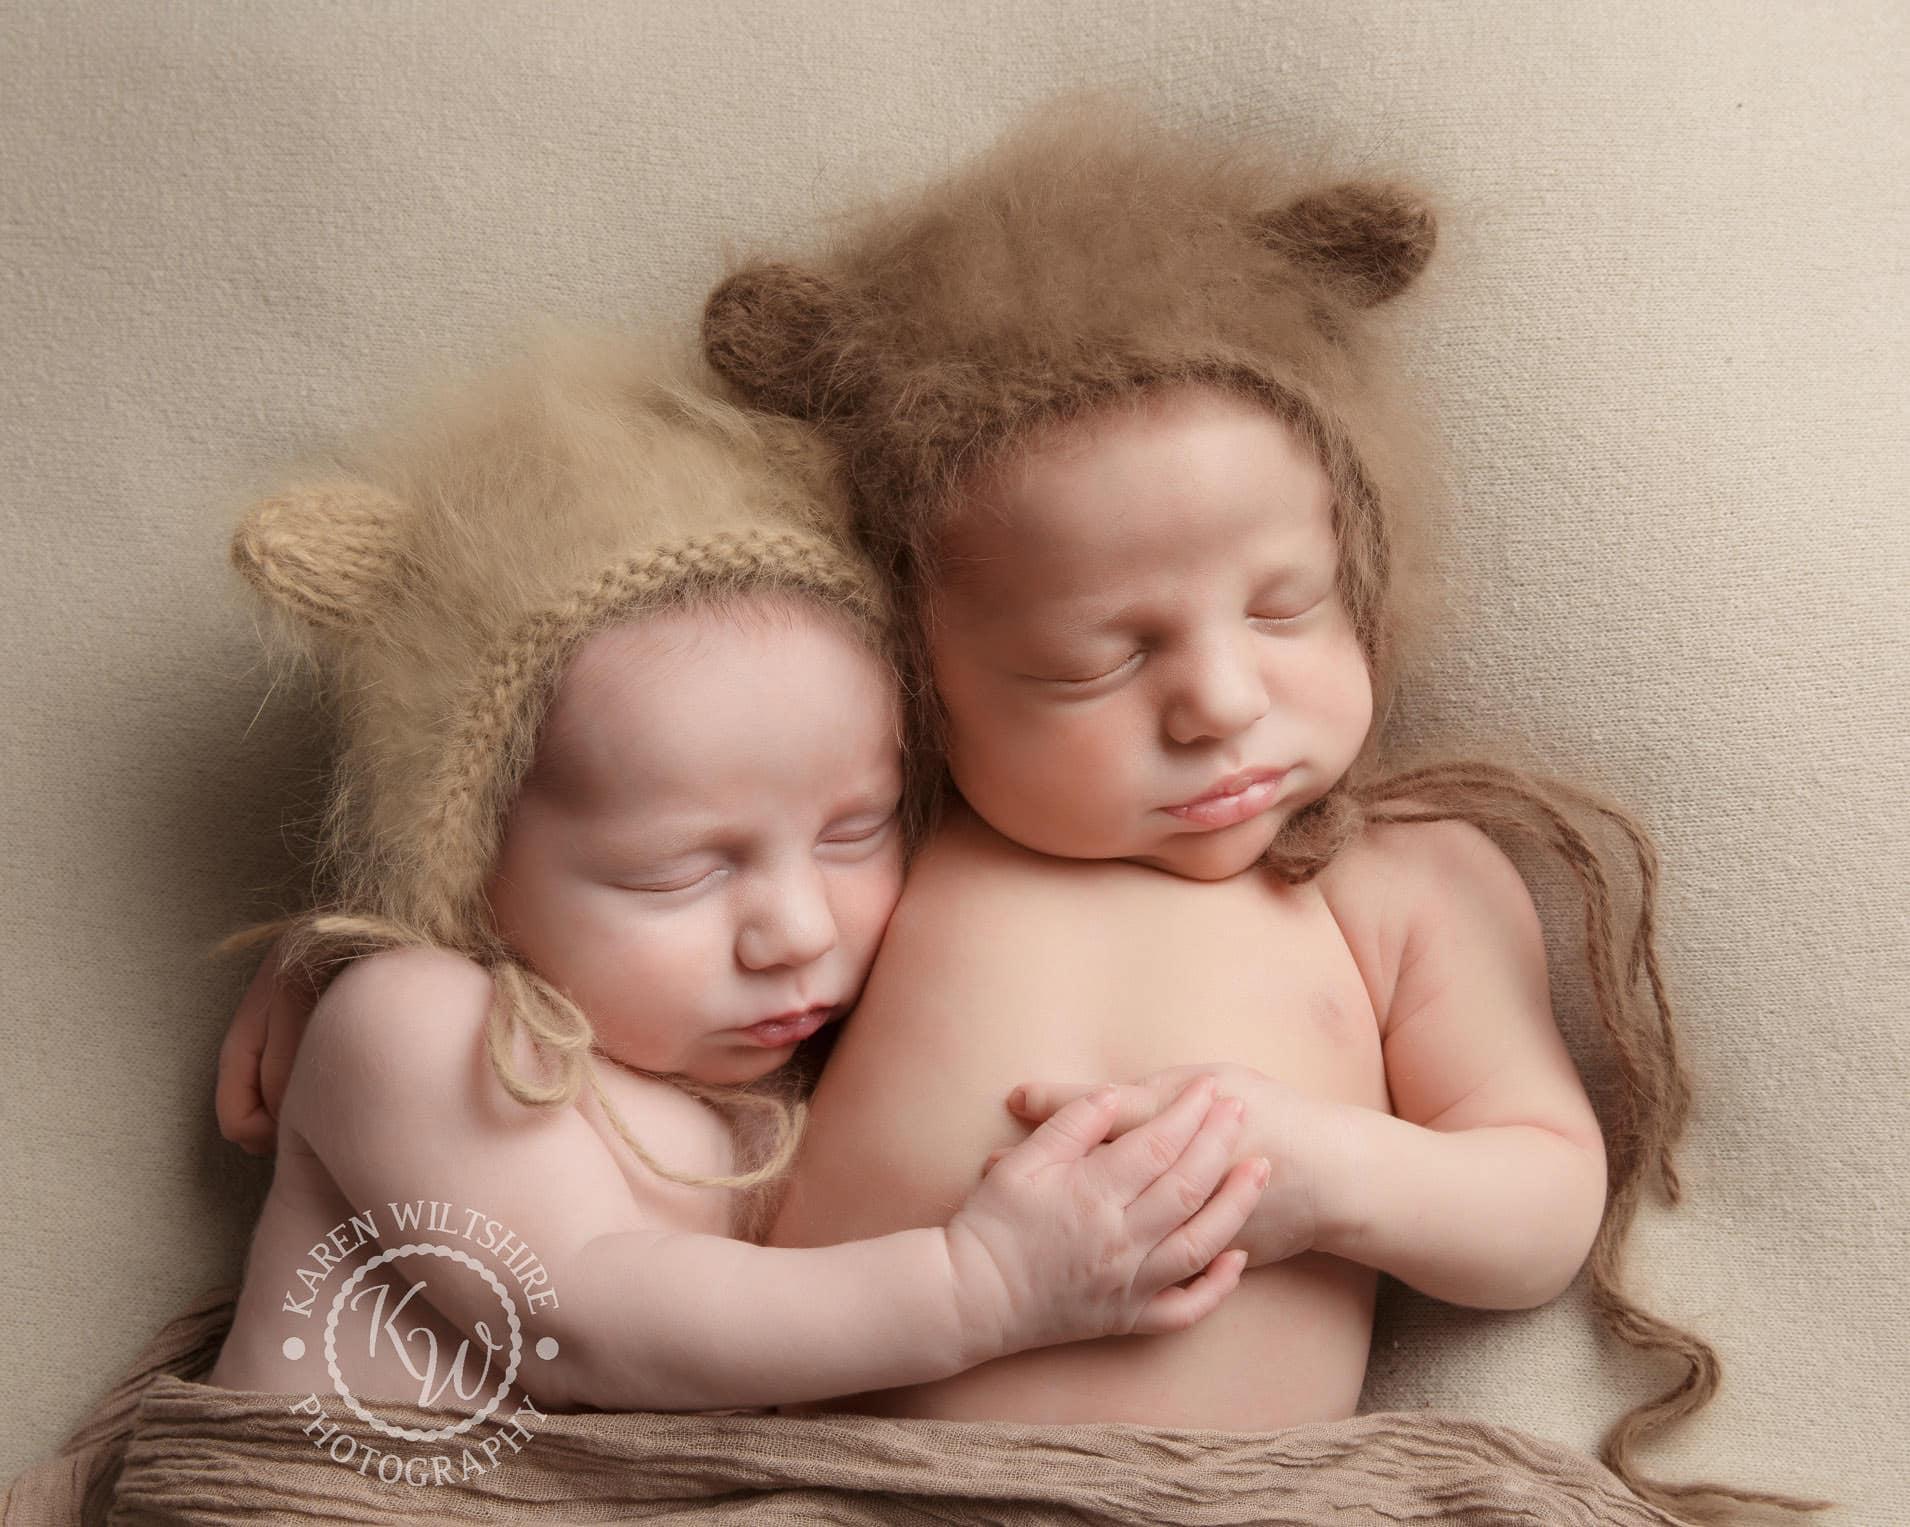 Newborn twins holding hands